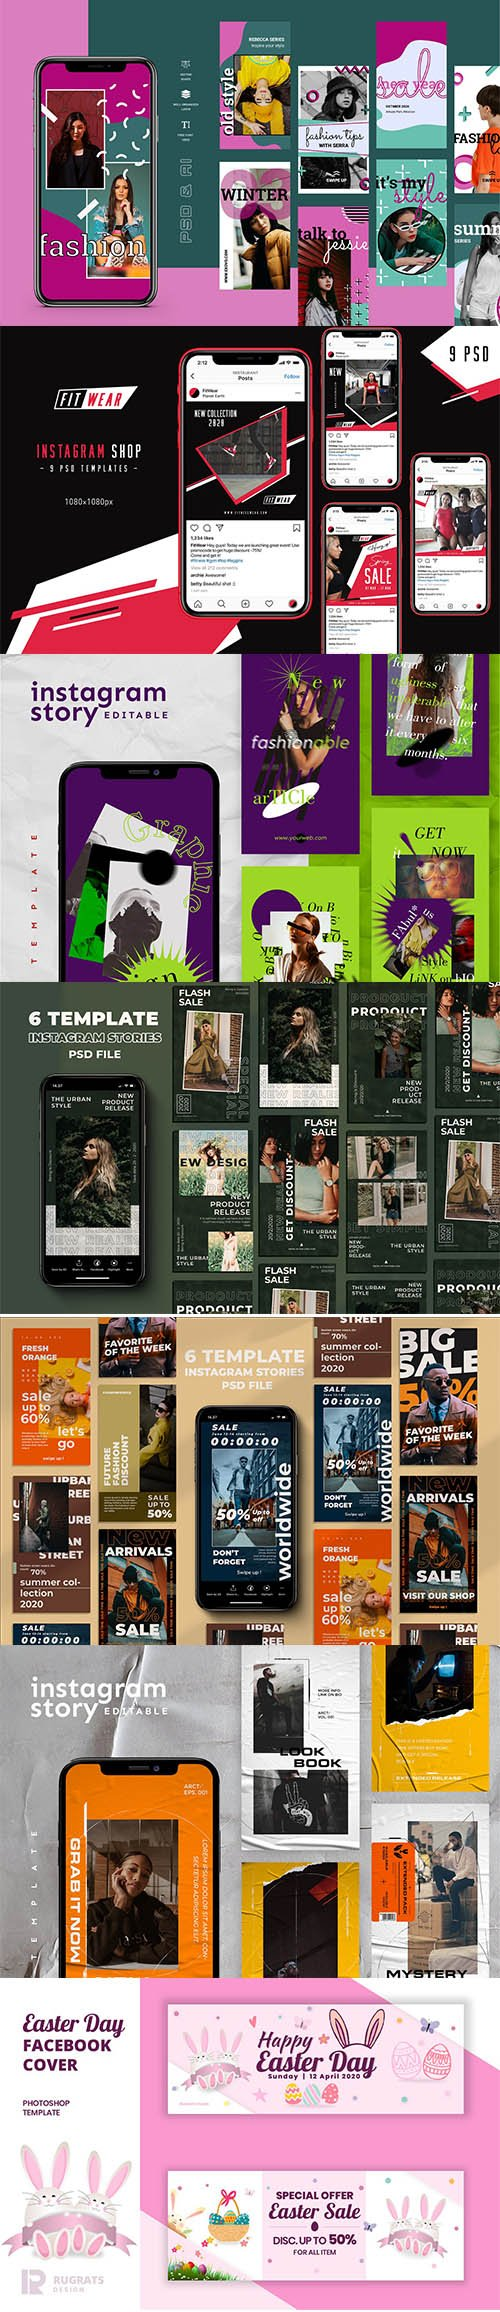 Instagram store Template Pack + Bonus Easter Facebook Cover